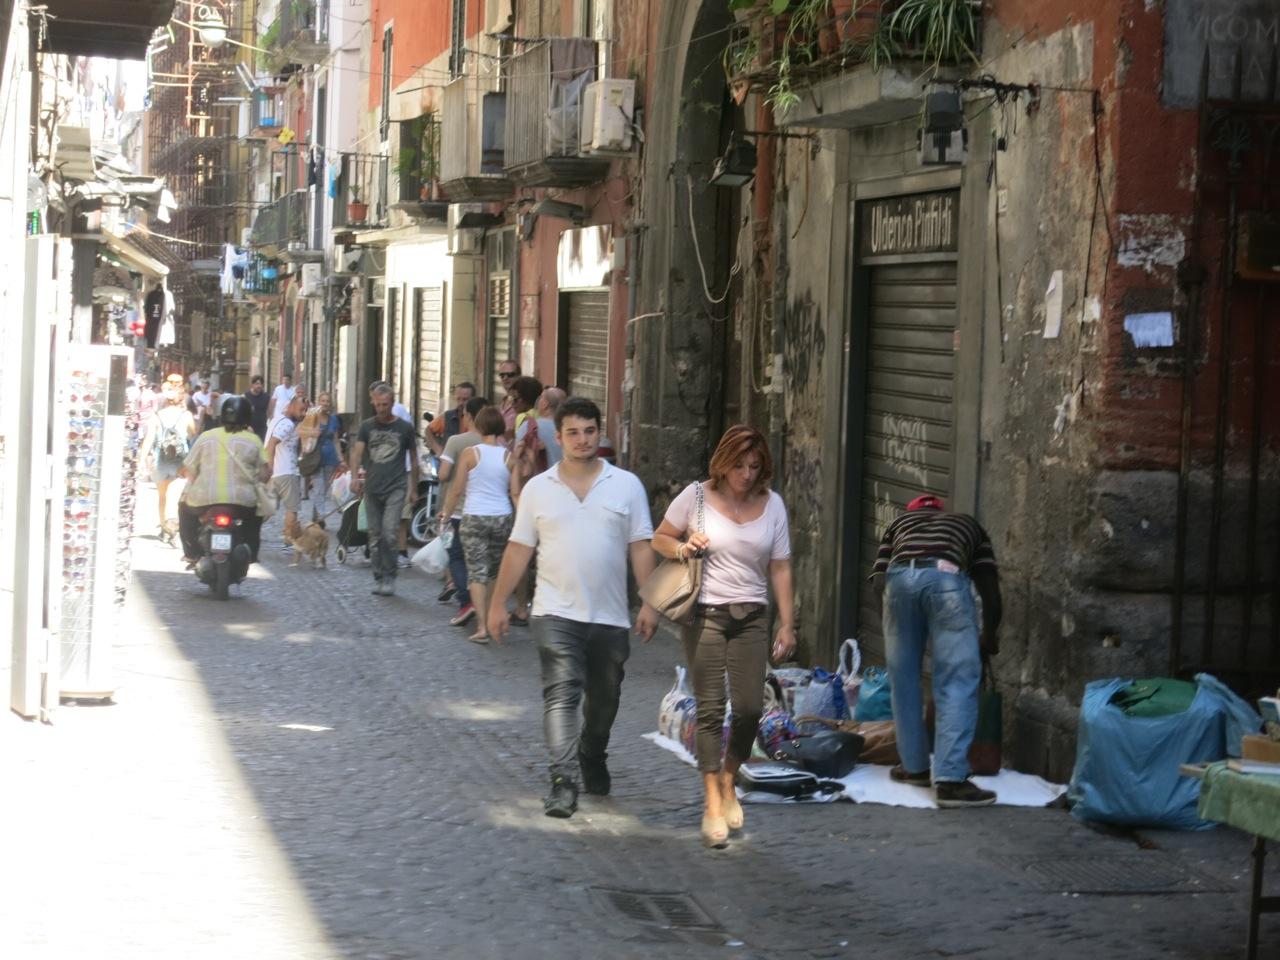 Napoli 1-22